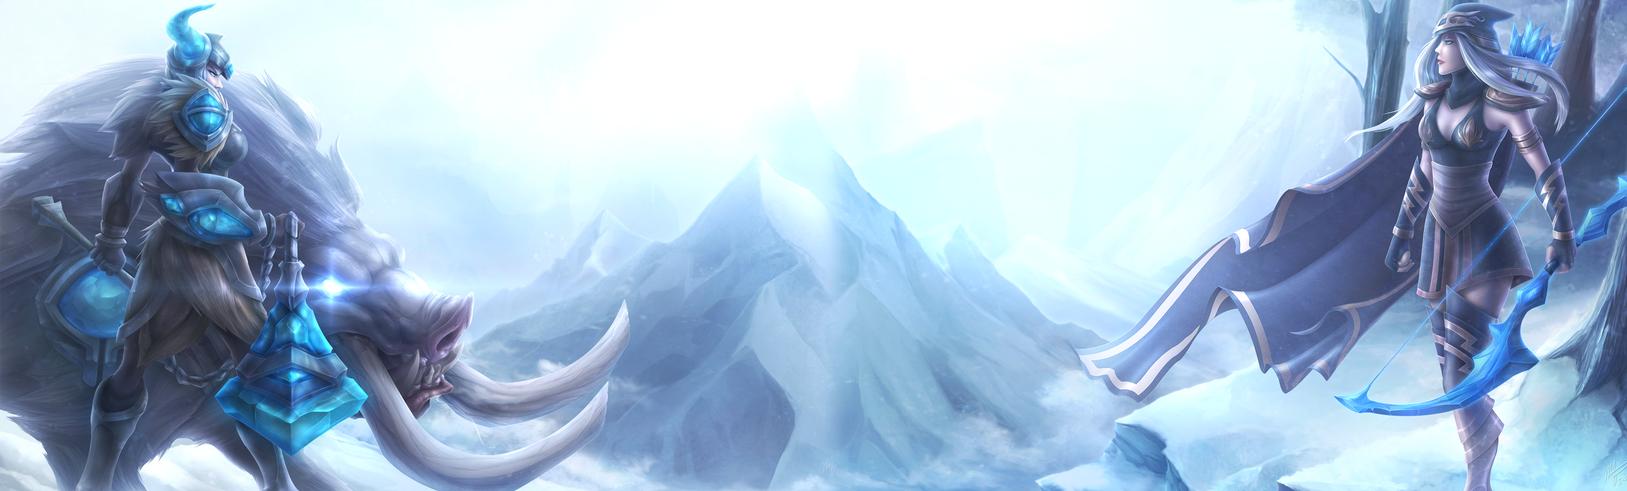 The Frostguard - Sejuani vs. Ashe by DenJento